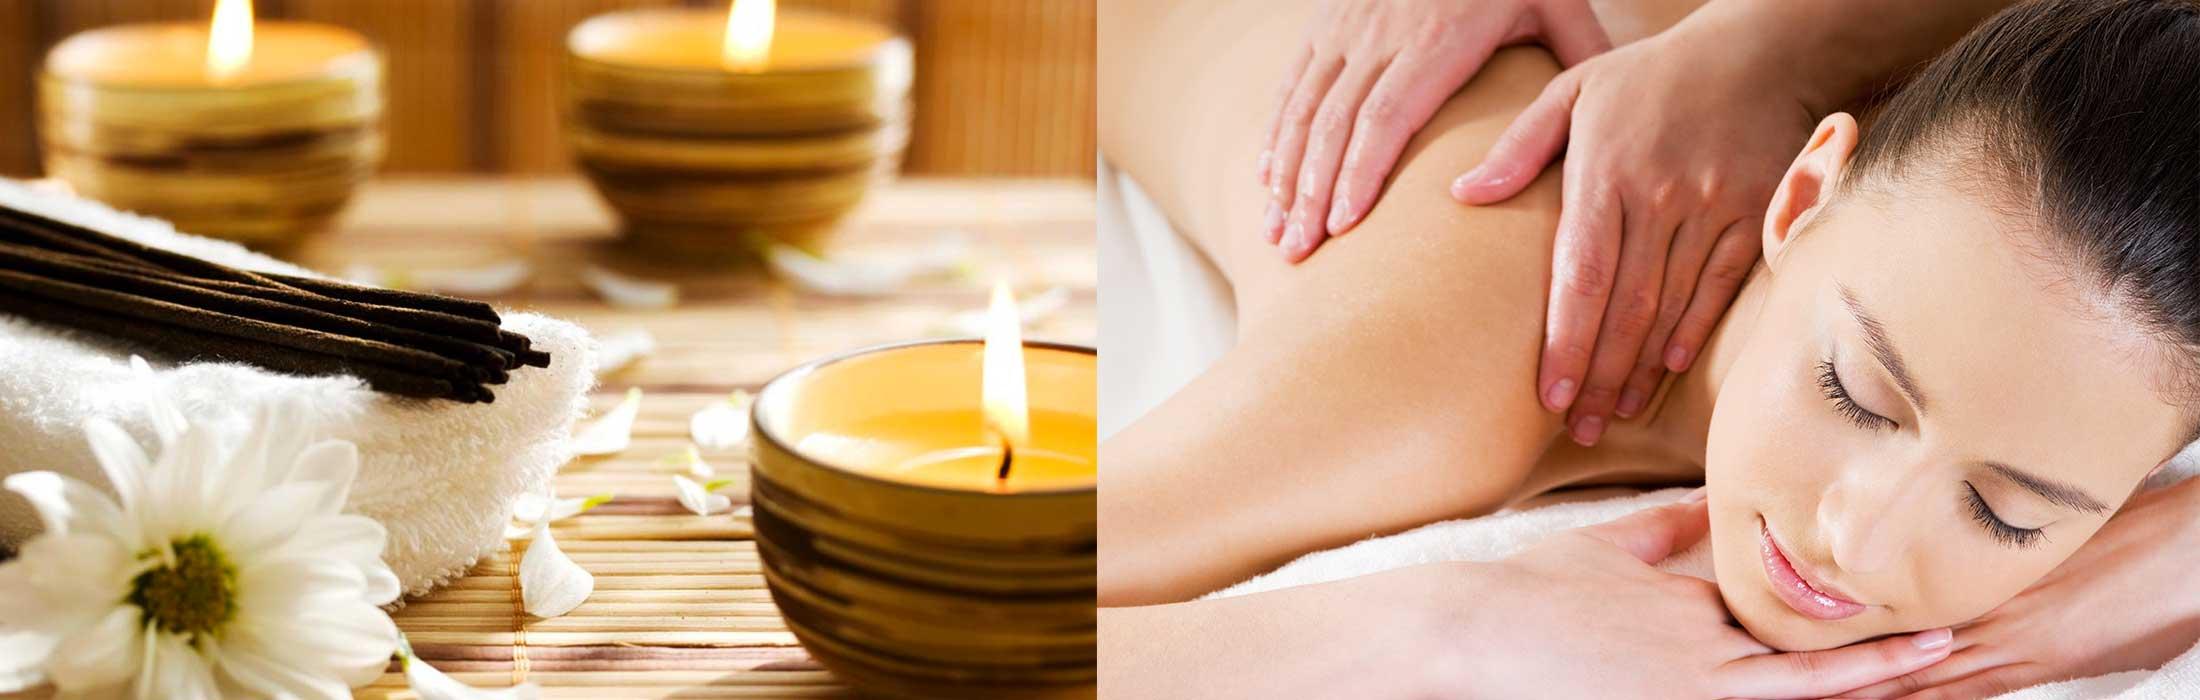 hym fam massage wellness spa day spa